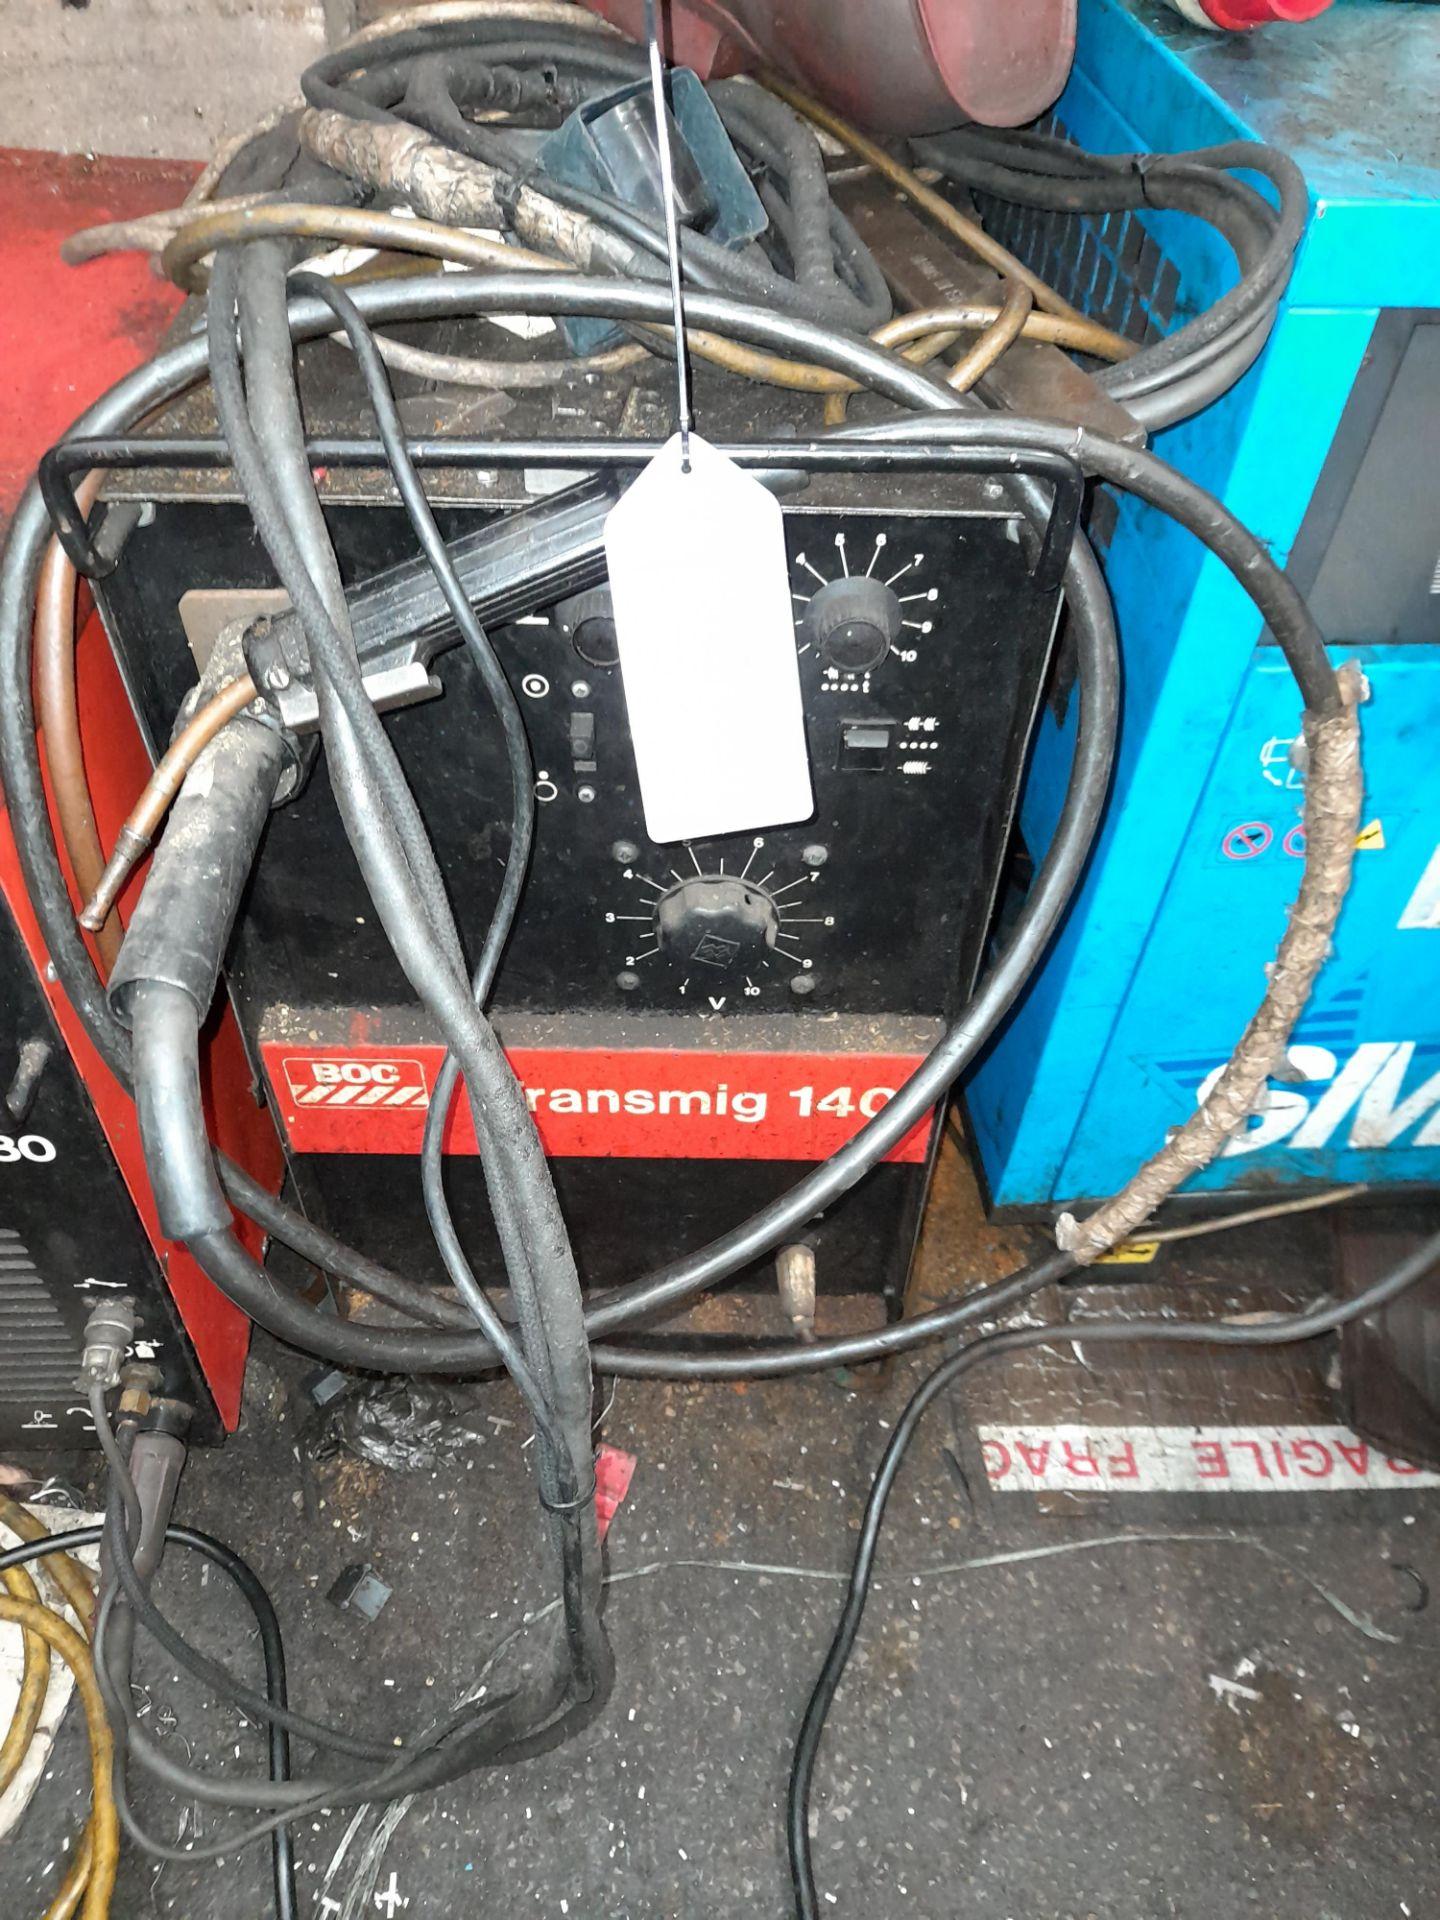 Transmig 140 Mig Welding Set